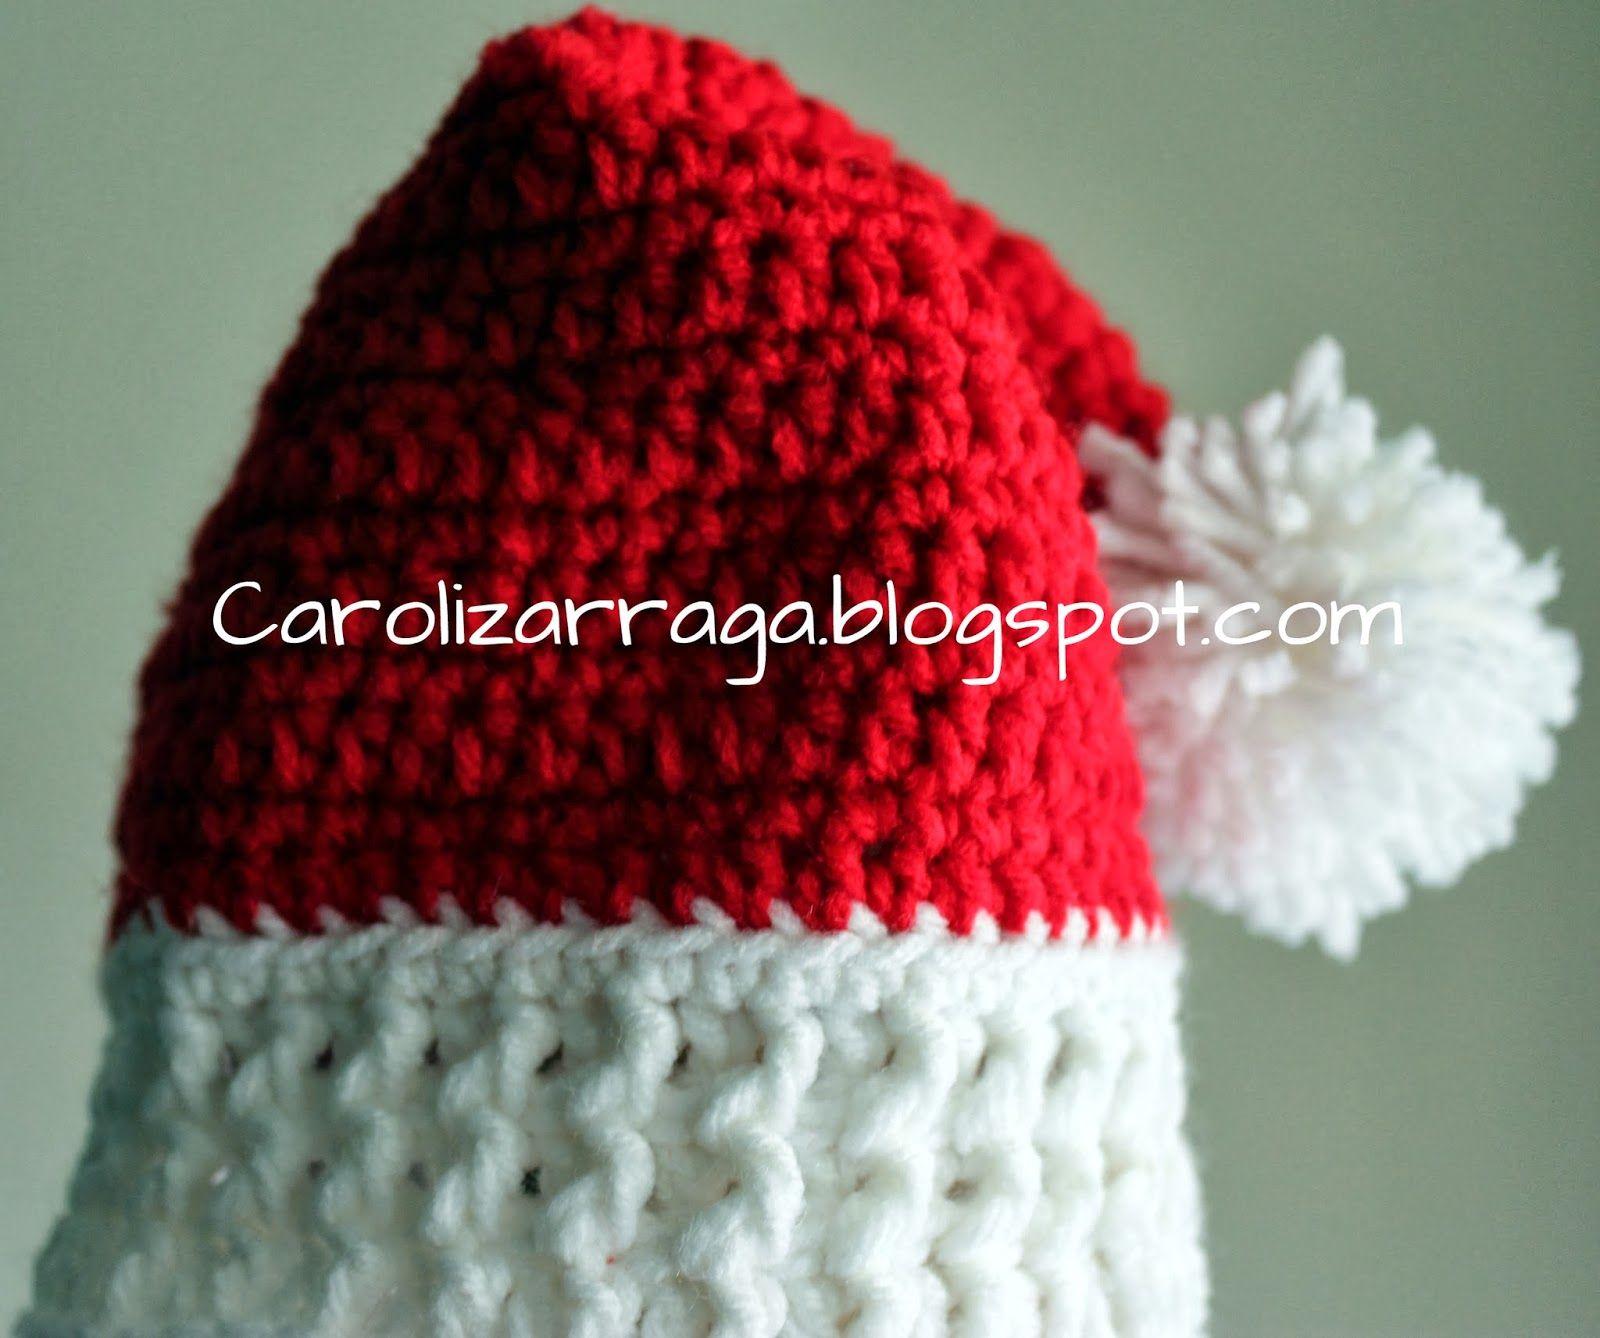 Patrones e ideas en Crochet..!!: Gorro navideno tejido a crochet ...